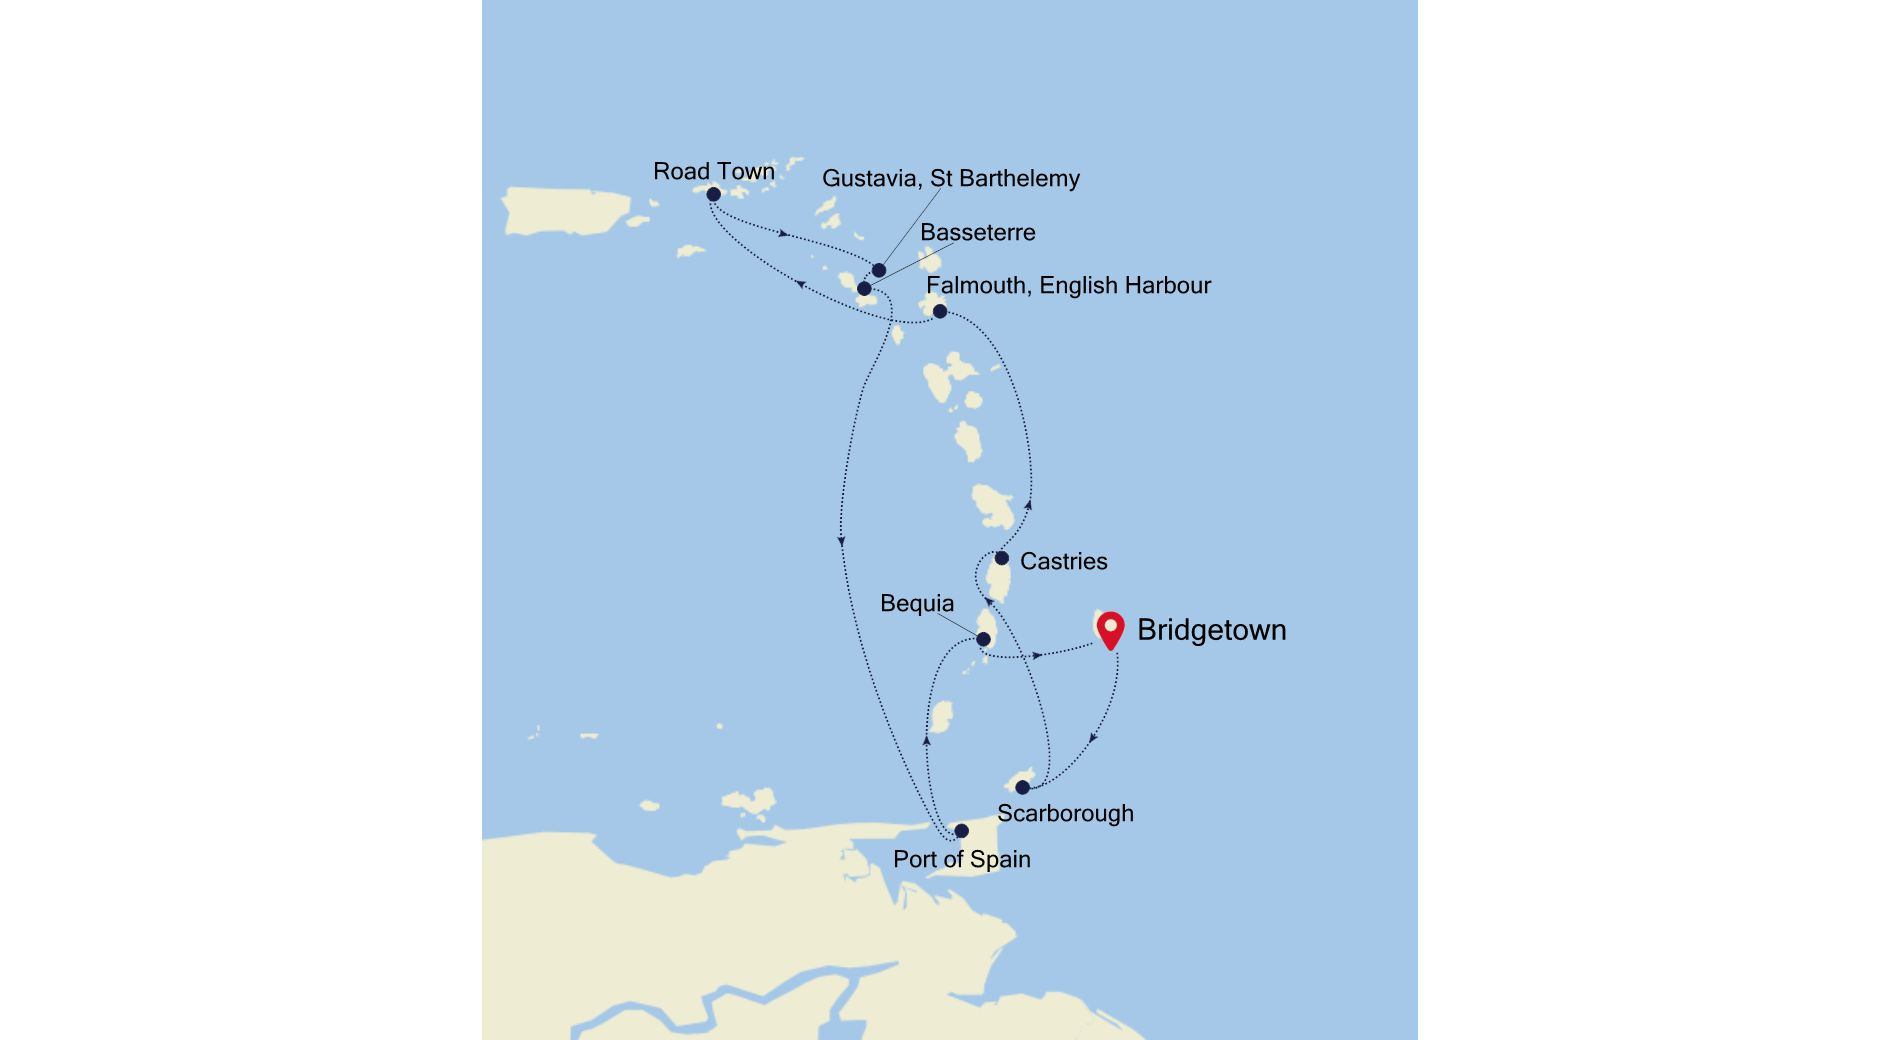 WH201218010 - Bridgetown nach Bridgetown